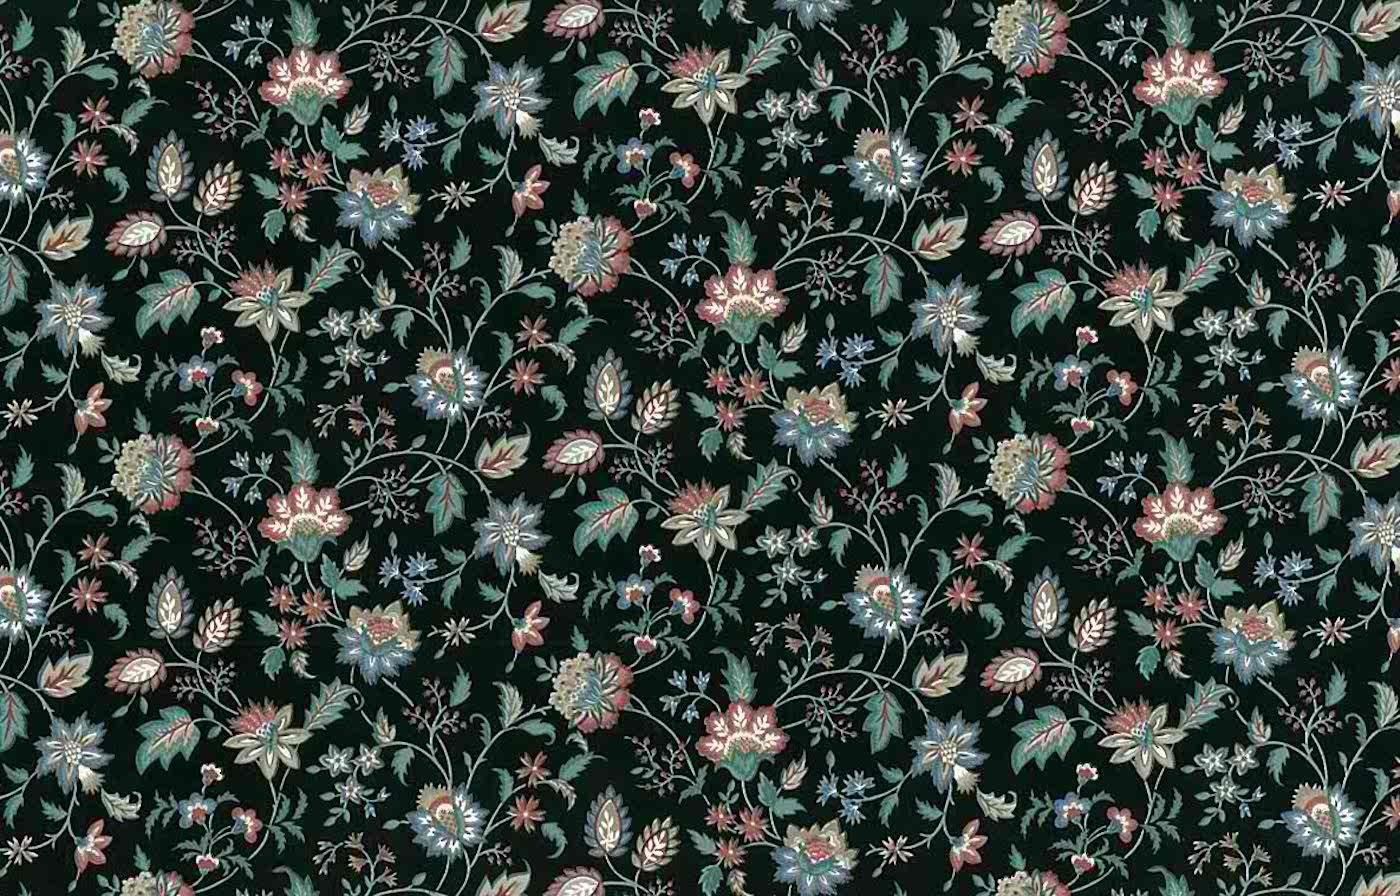 Paisley Vintage Wallpaper Black Green Blue Rose White